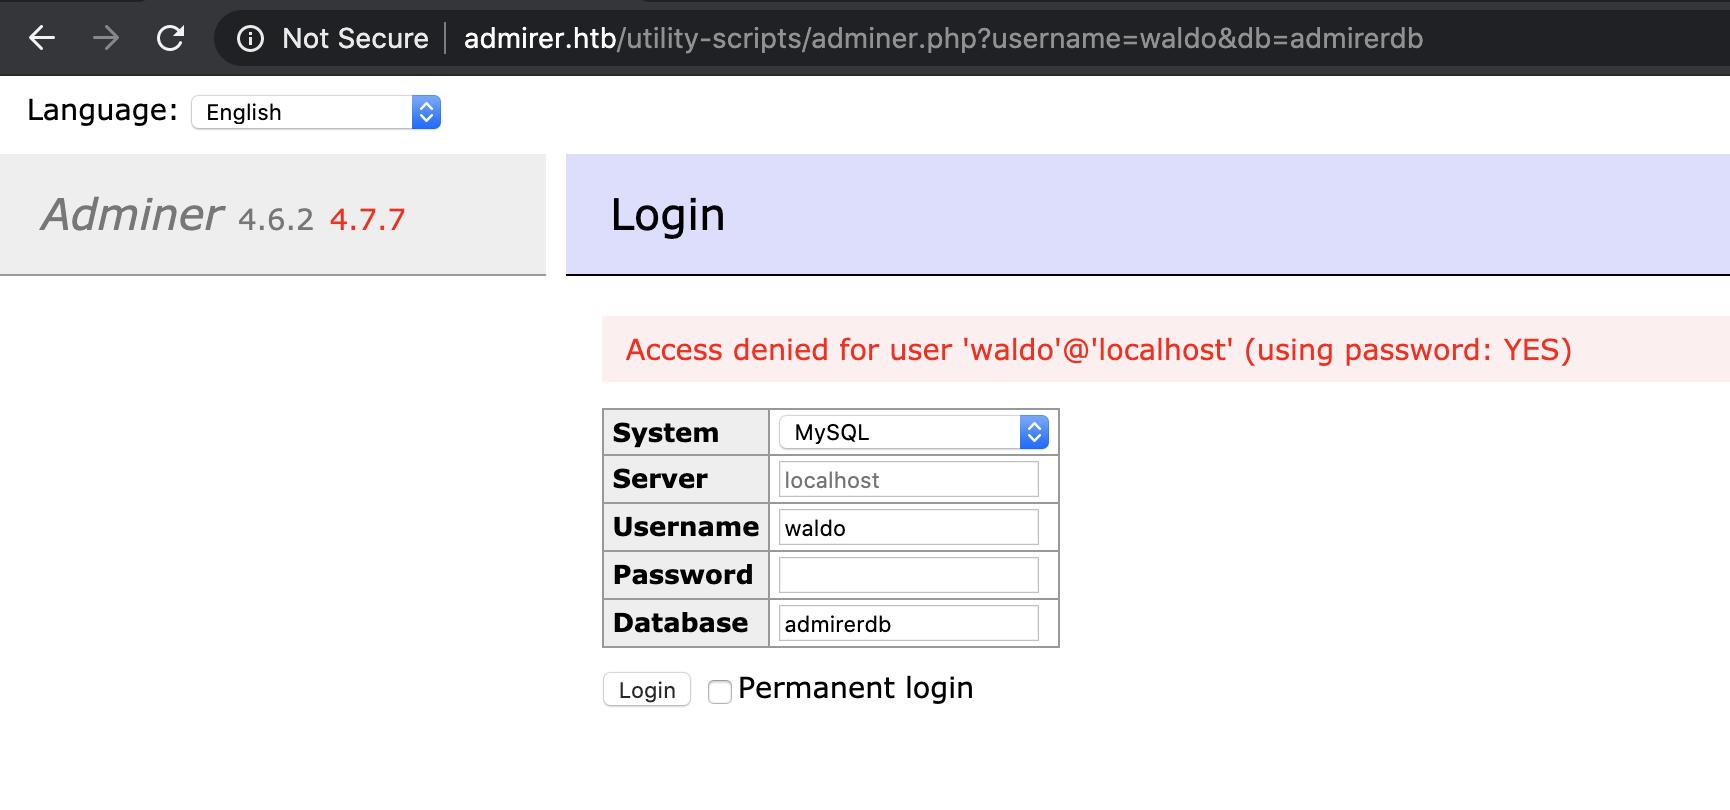 admirer adminer homepage